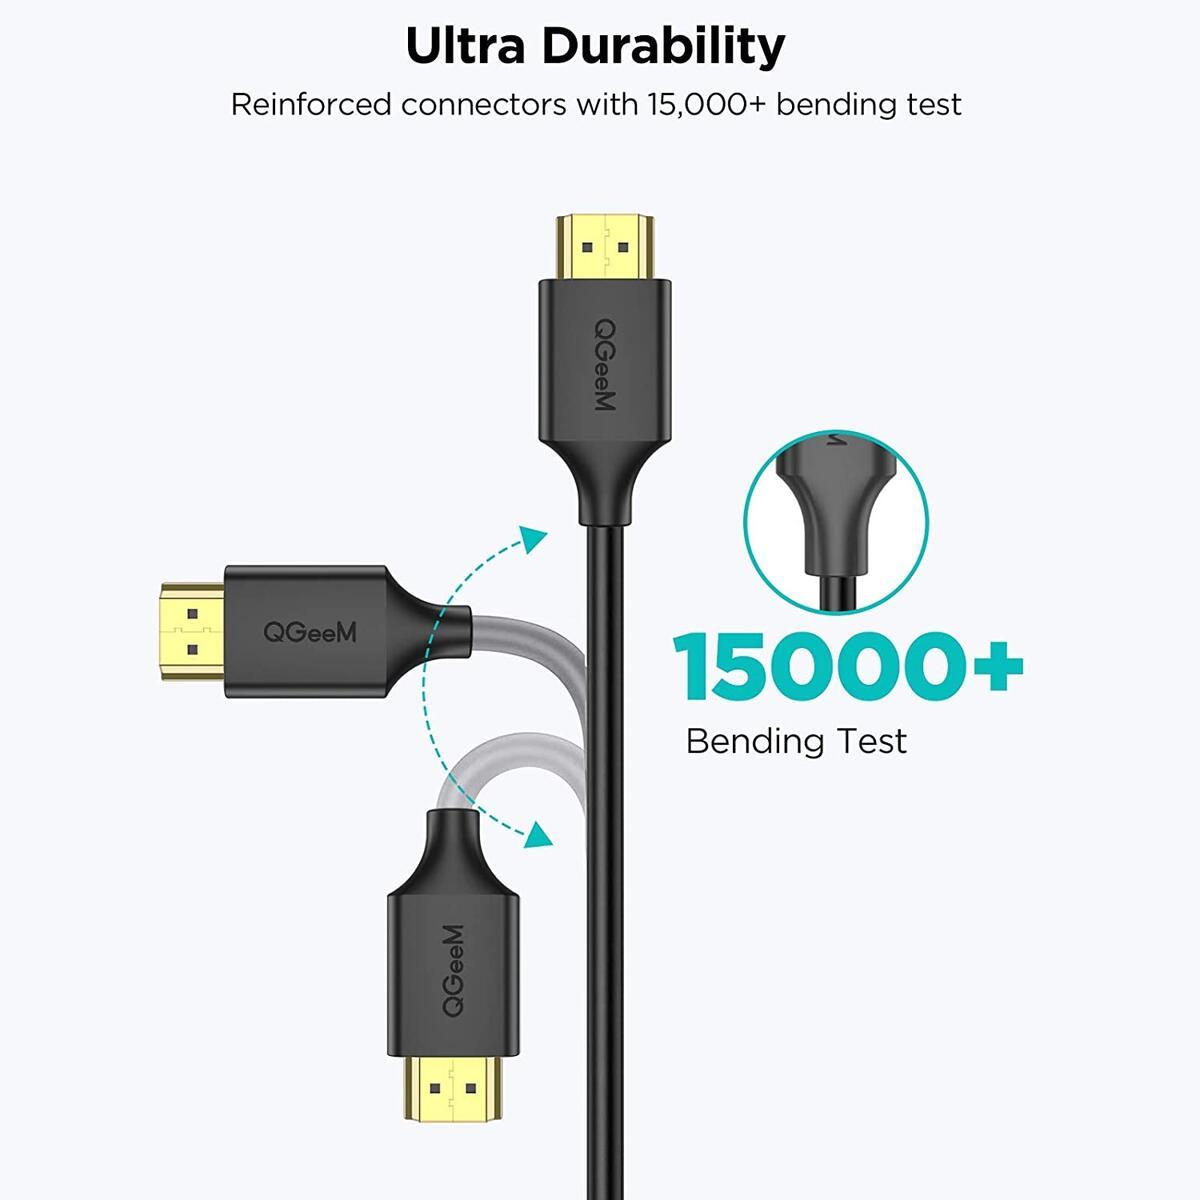 Mini HDMI to HDMI Cable 6FT, High Speed 4K 60Hz HDMI 2.0 Cord, Compatible with Sony HDR-XR50, Nikon Z6 Canon EOS RP/EOS R/EOS 7D Mark II / XA40,Lenovo Thinkpad Yoga, Mini HDMI Cable